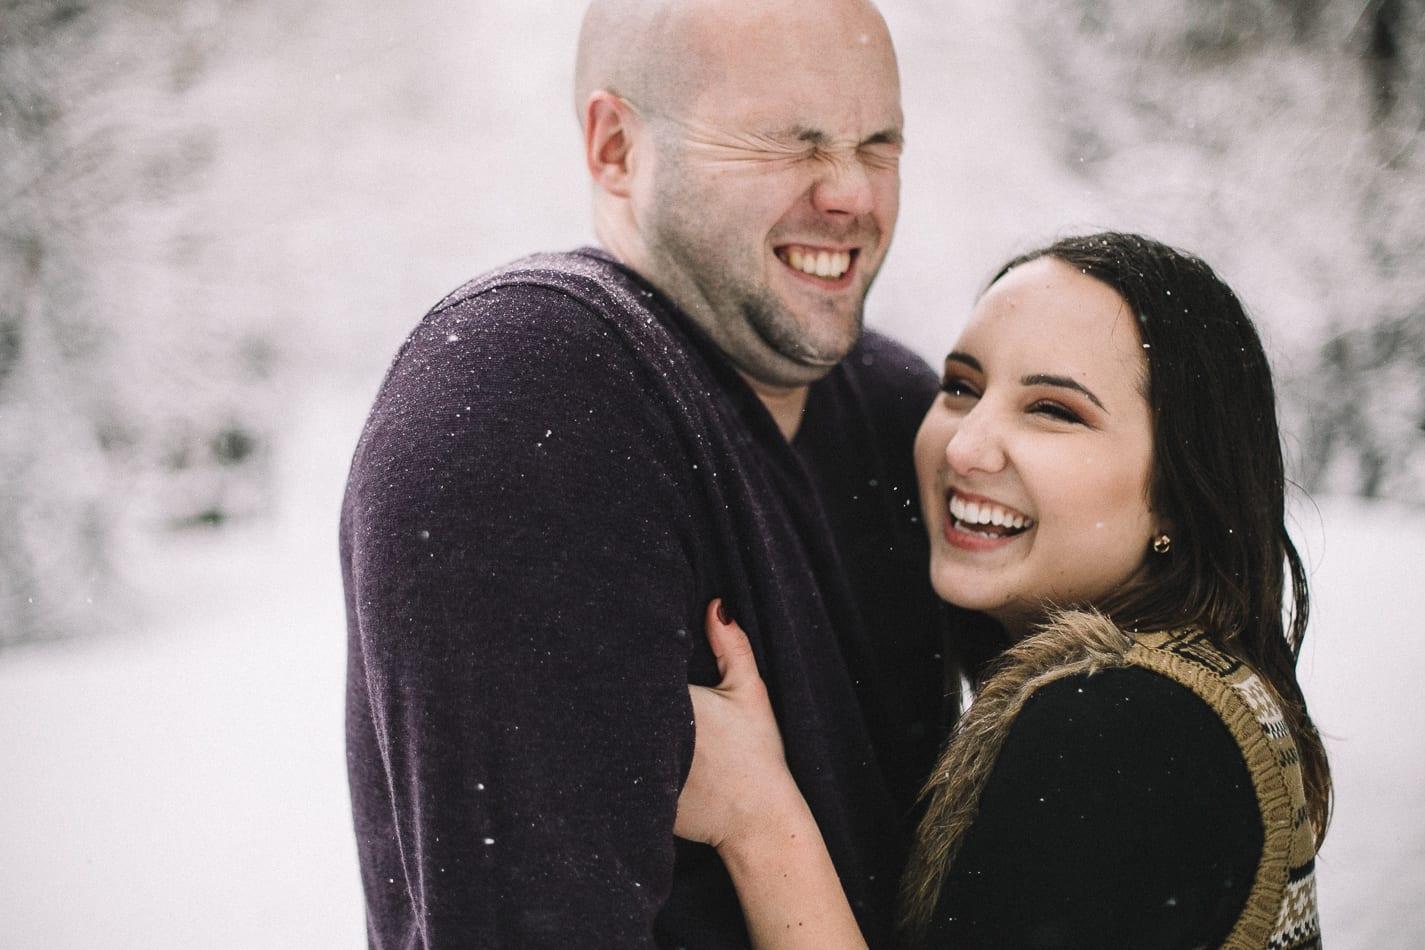 mount-lassen-winter-engagement-photo-10